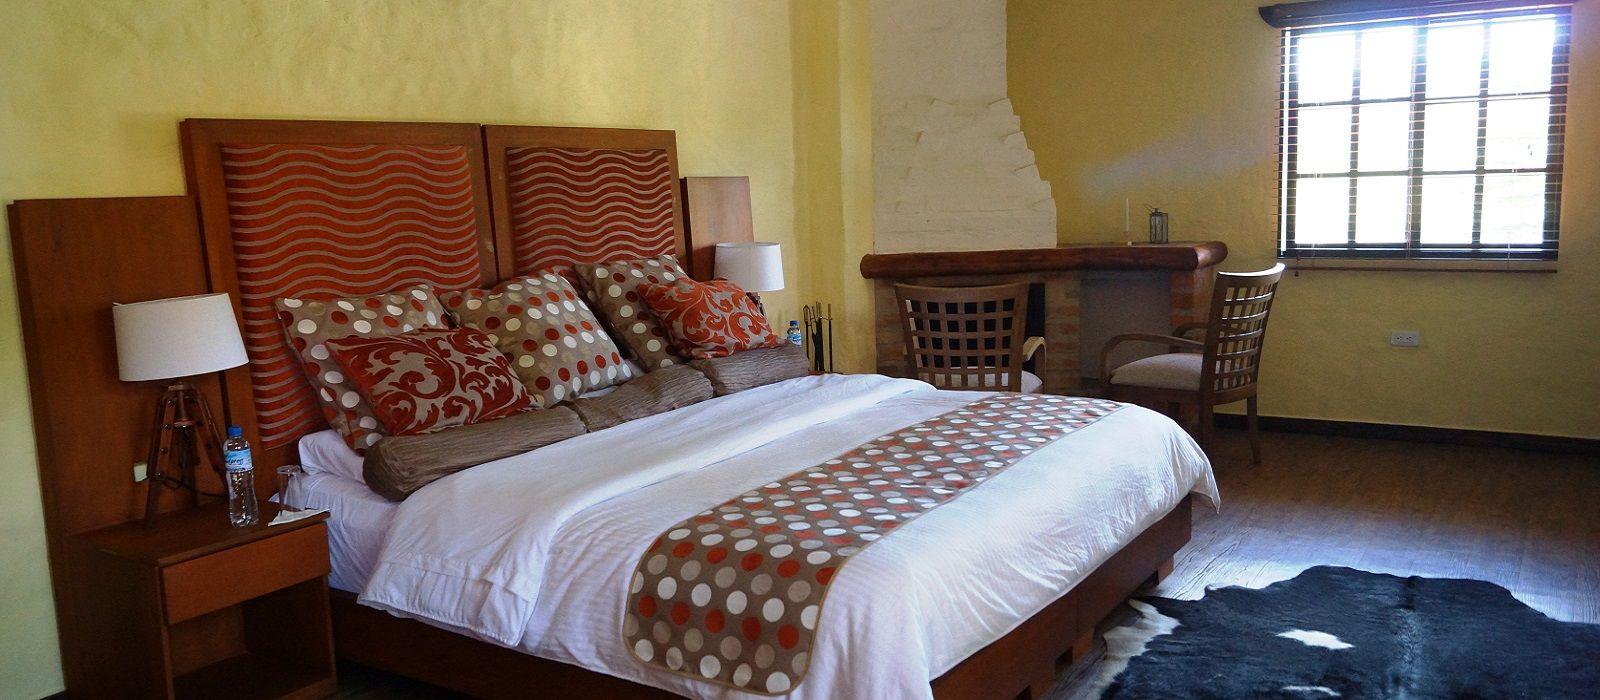 Hotel Monasterio San Agustin Colombia